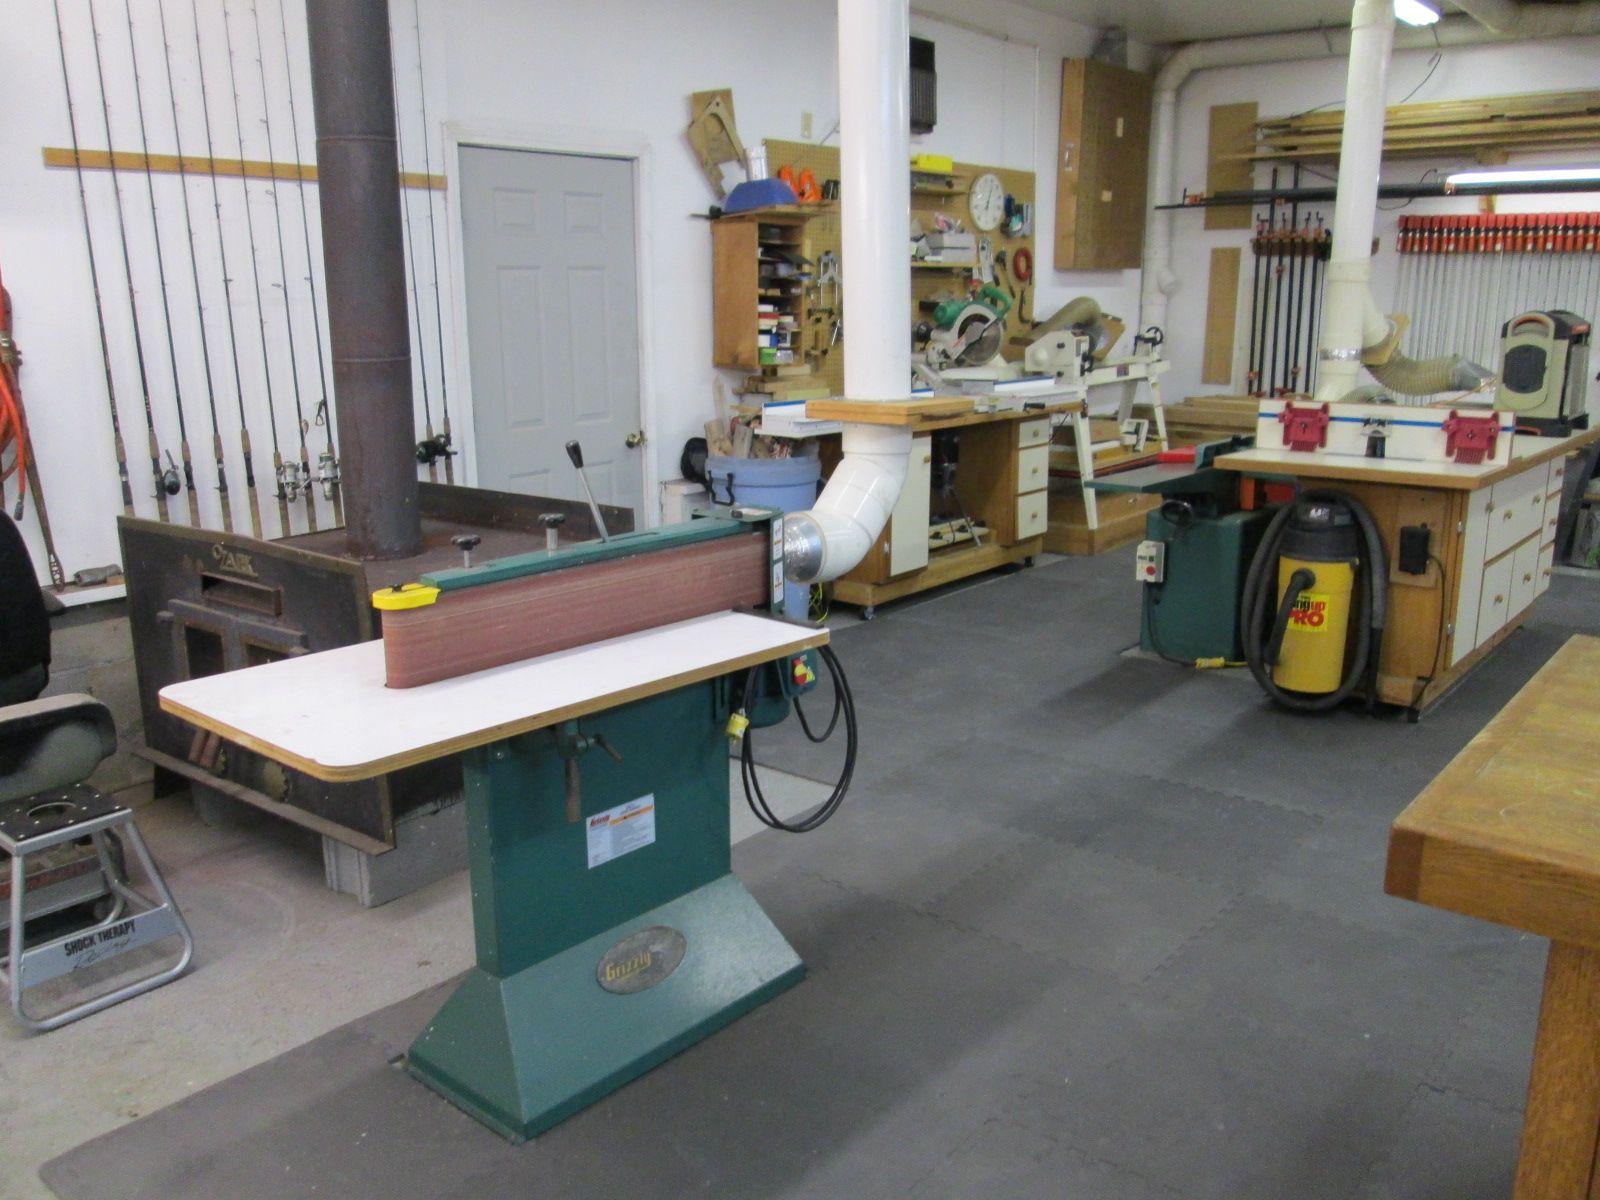 workshop design shop layout garage workshop woodworking shop carpenter wood working [ 1600 x 1200 Pixel ]